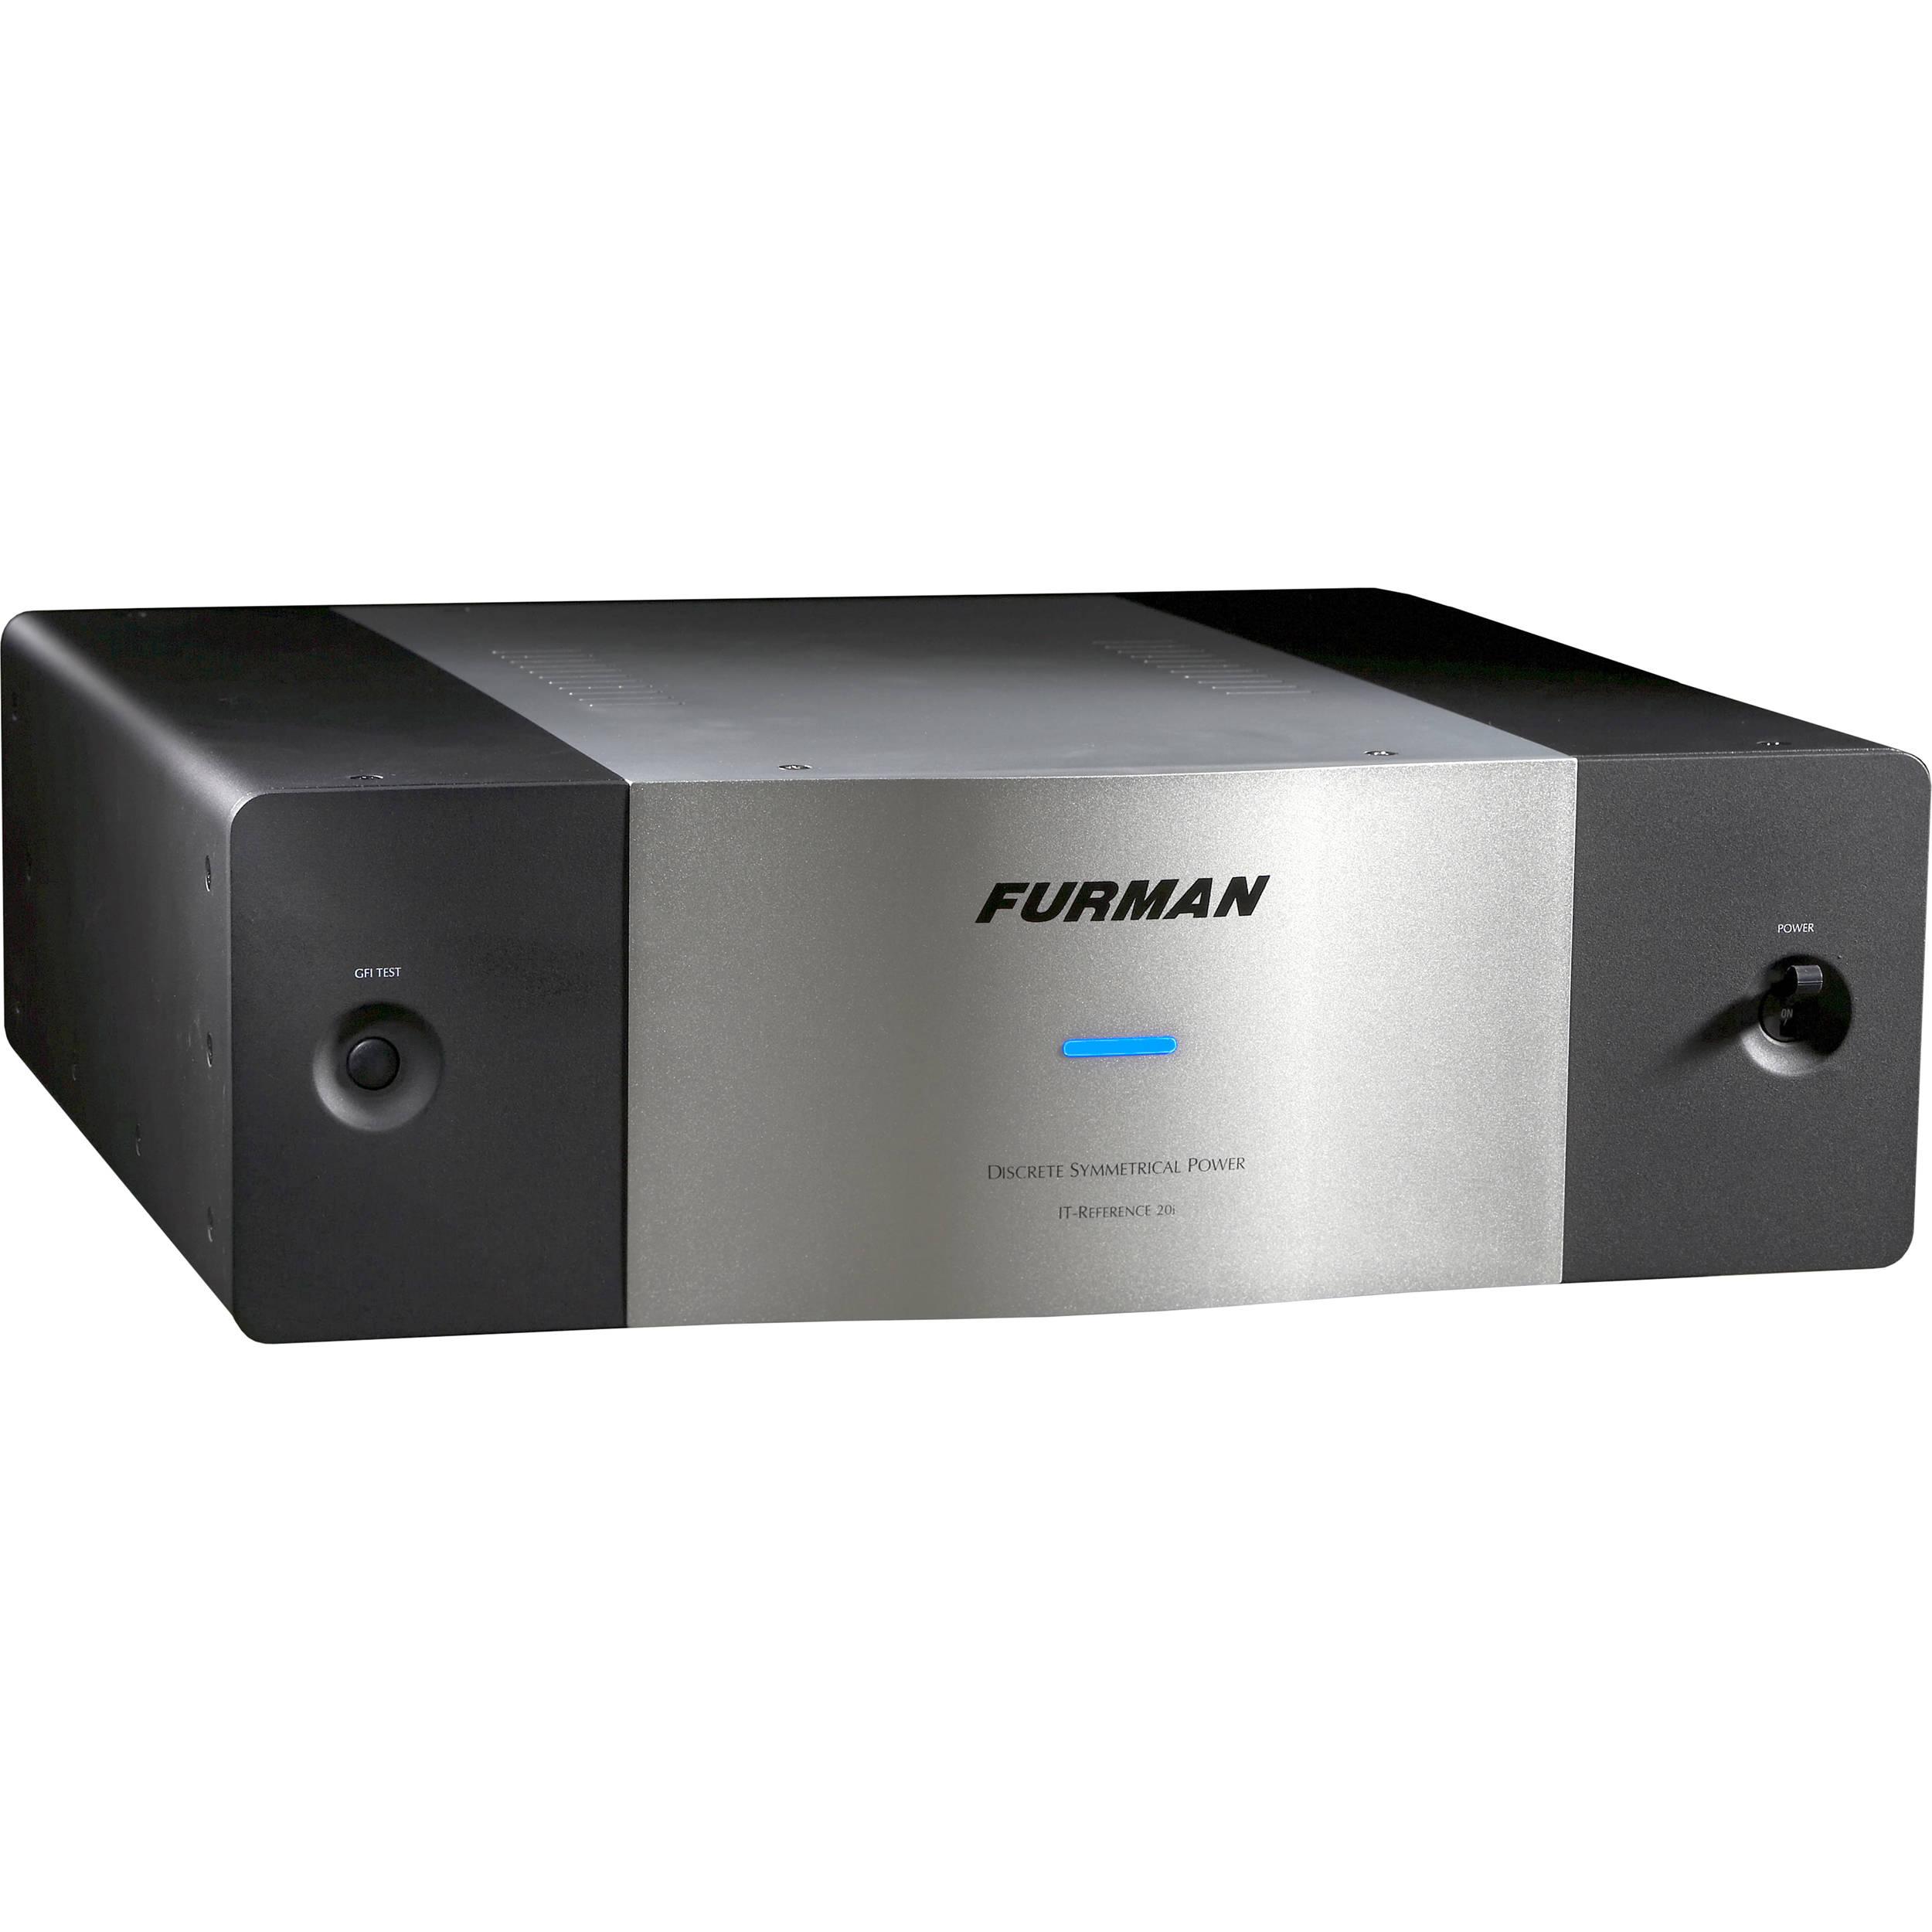 furman it ref 20i it reference 20i discrete symmetrical